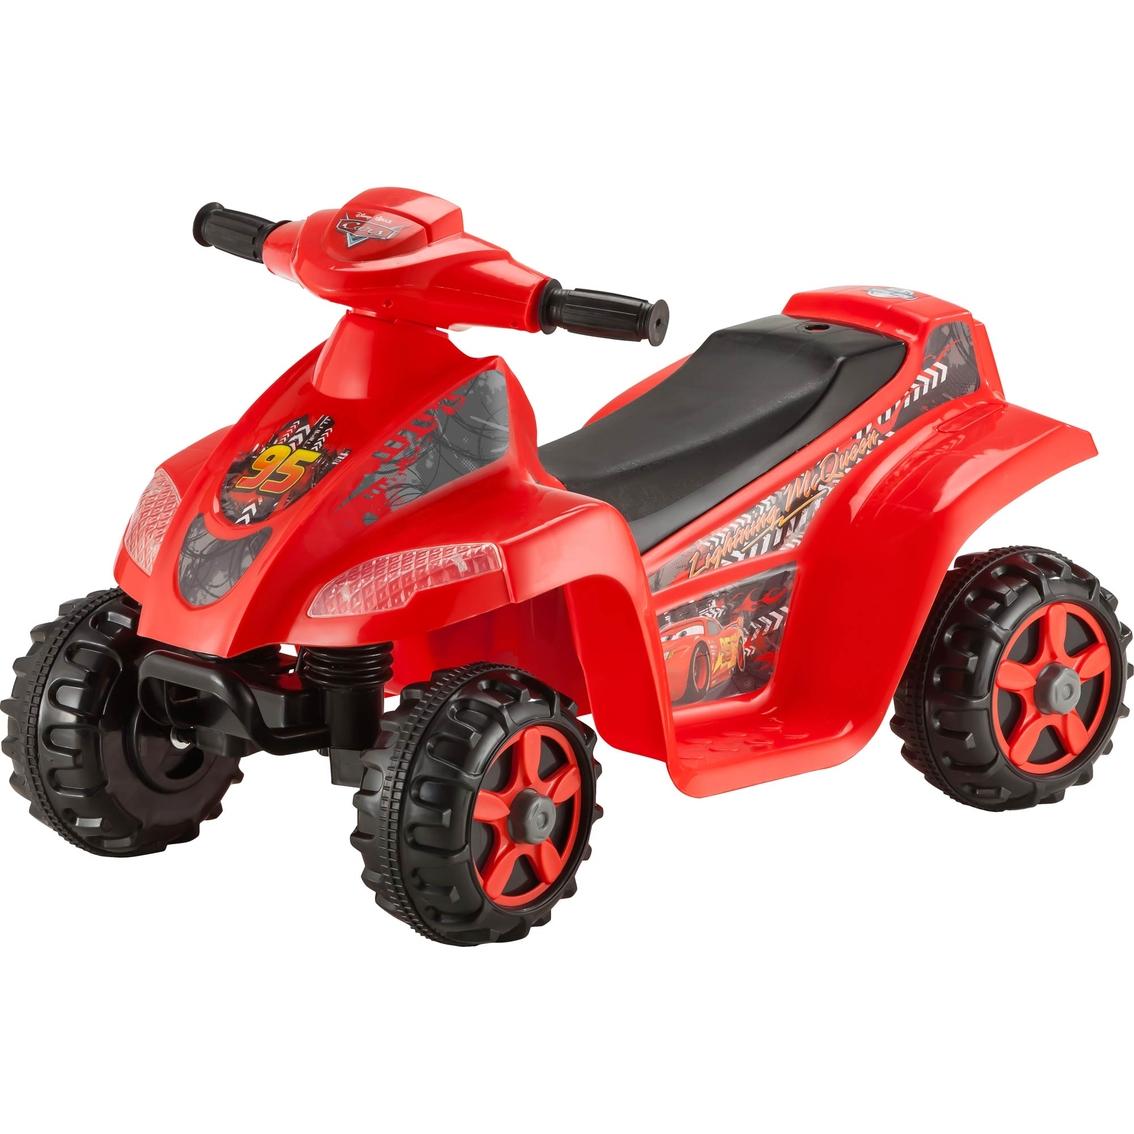 Disney Cars Toddler Quad 6v Electric Ride On Battery